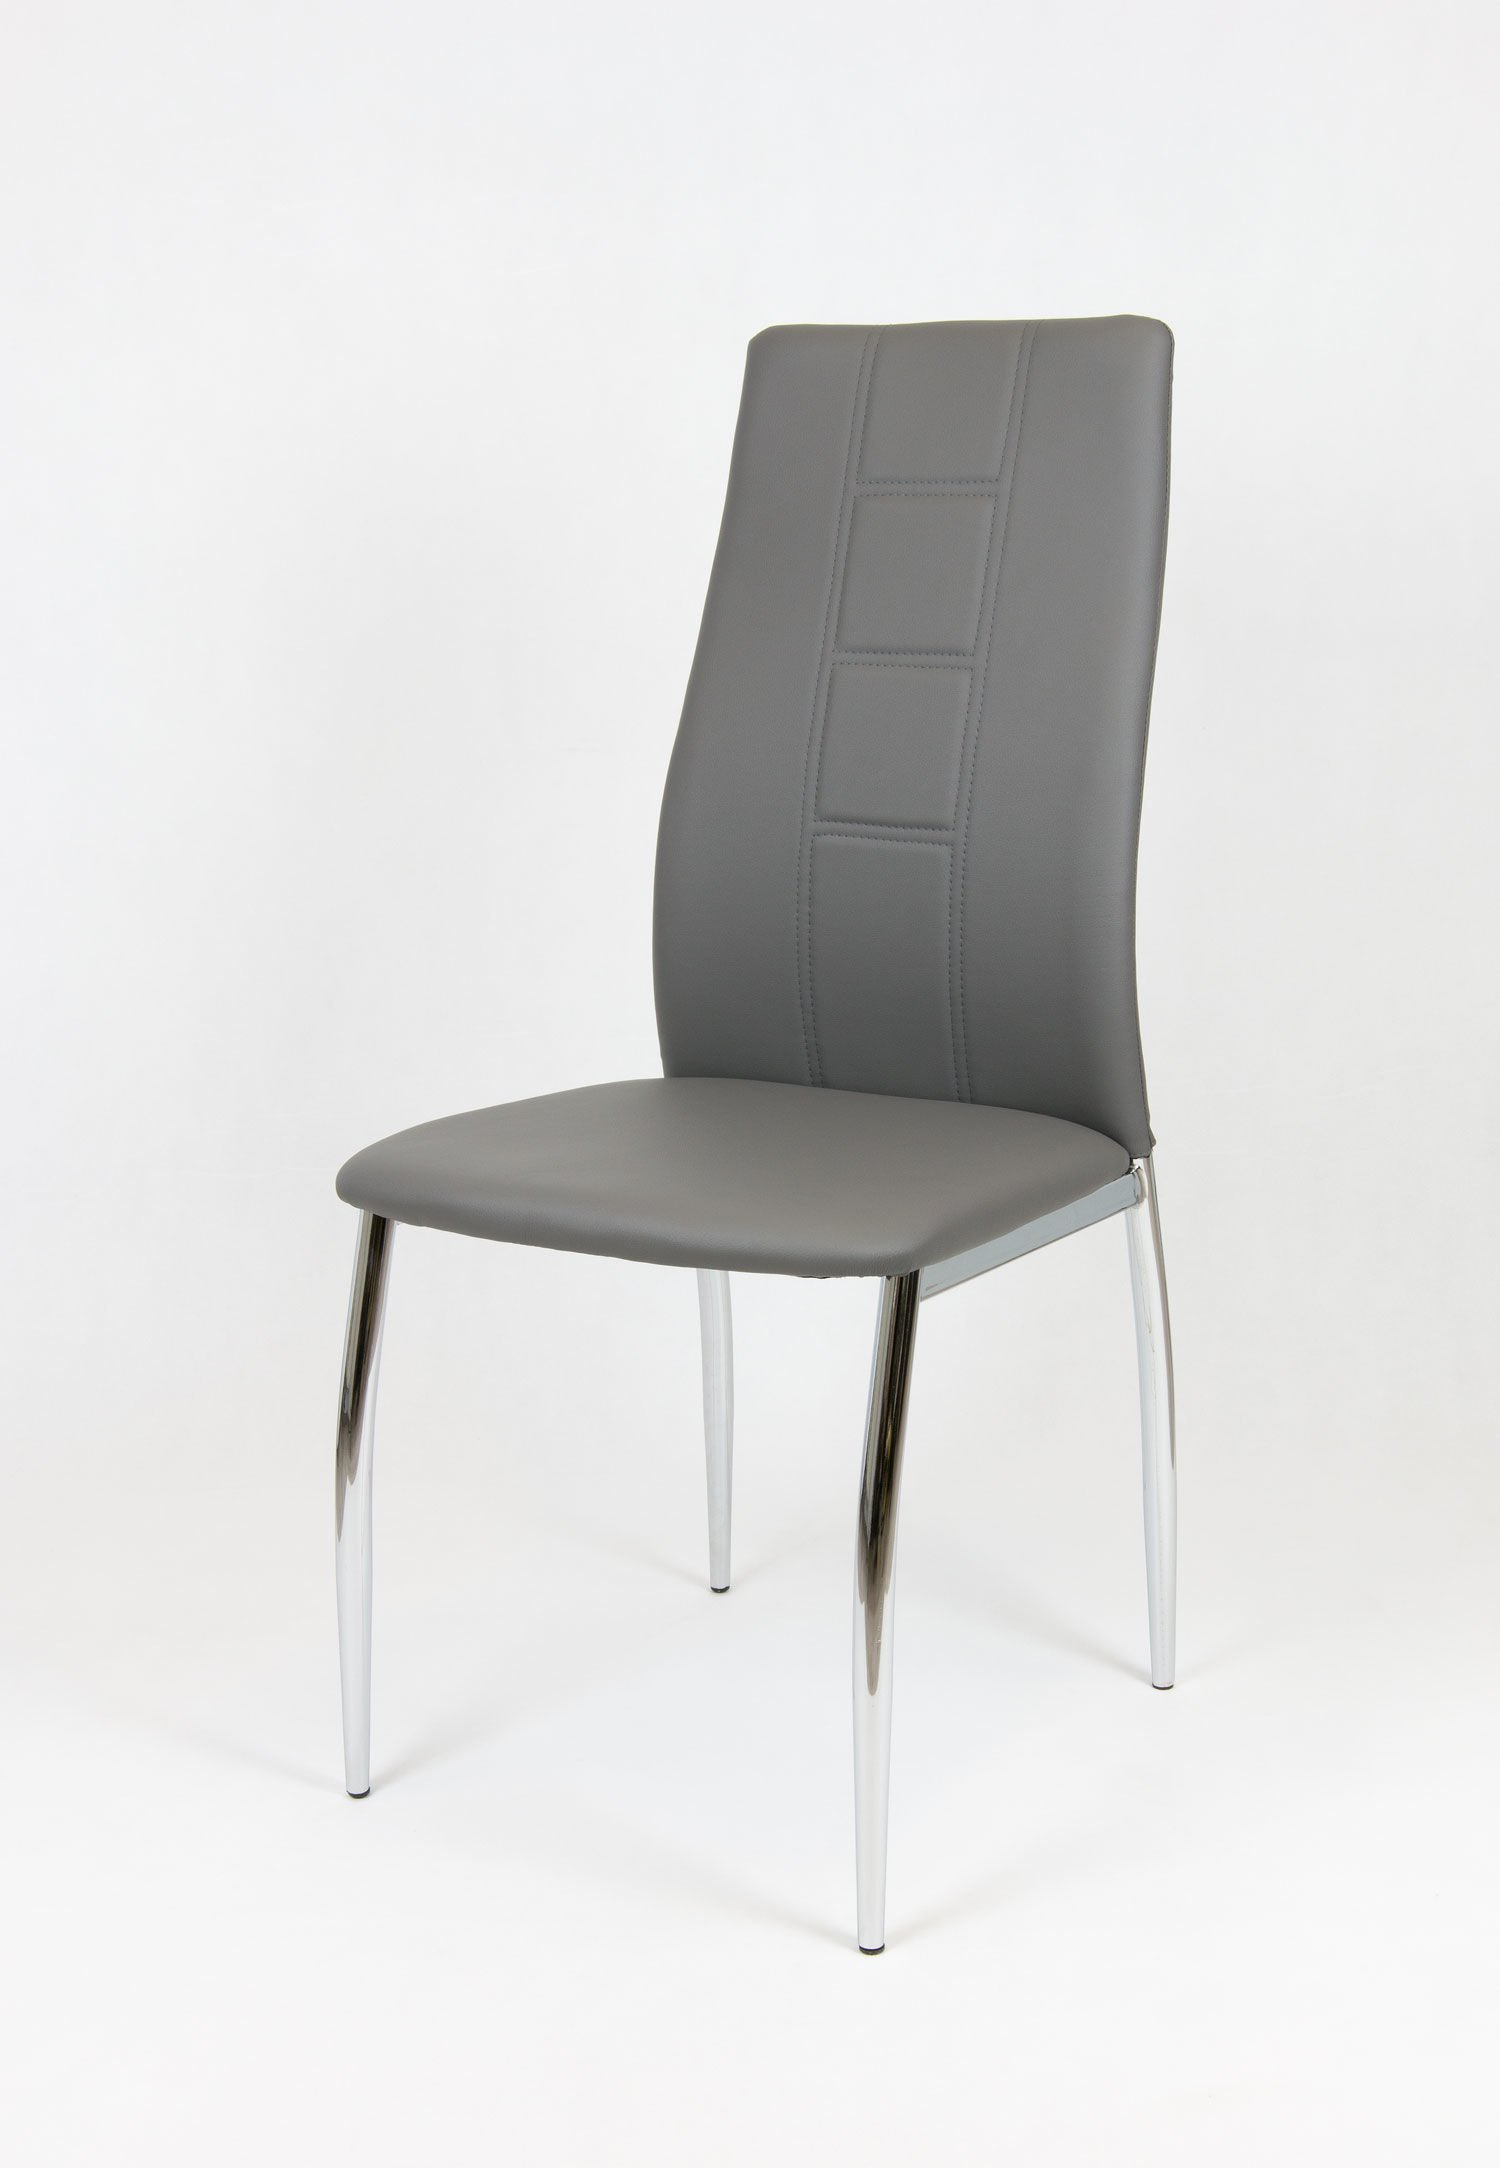 Sk design ks026 grau kunsleder stuhl mit chromgestell grau for Designer stuhl grau